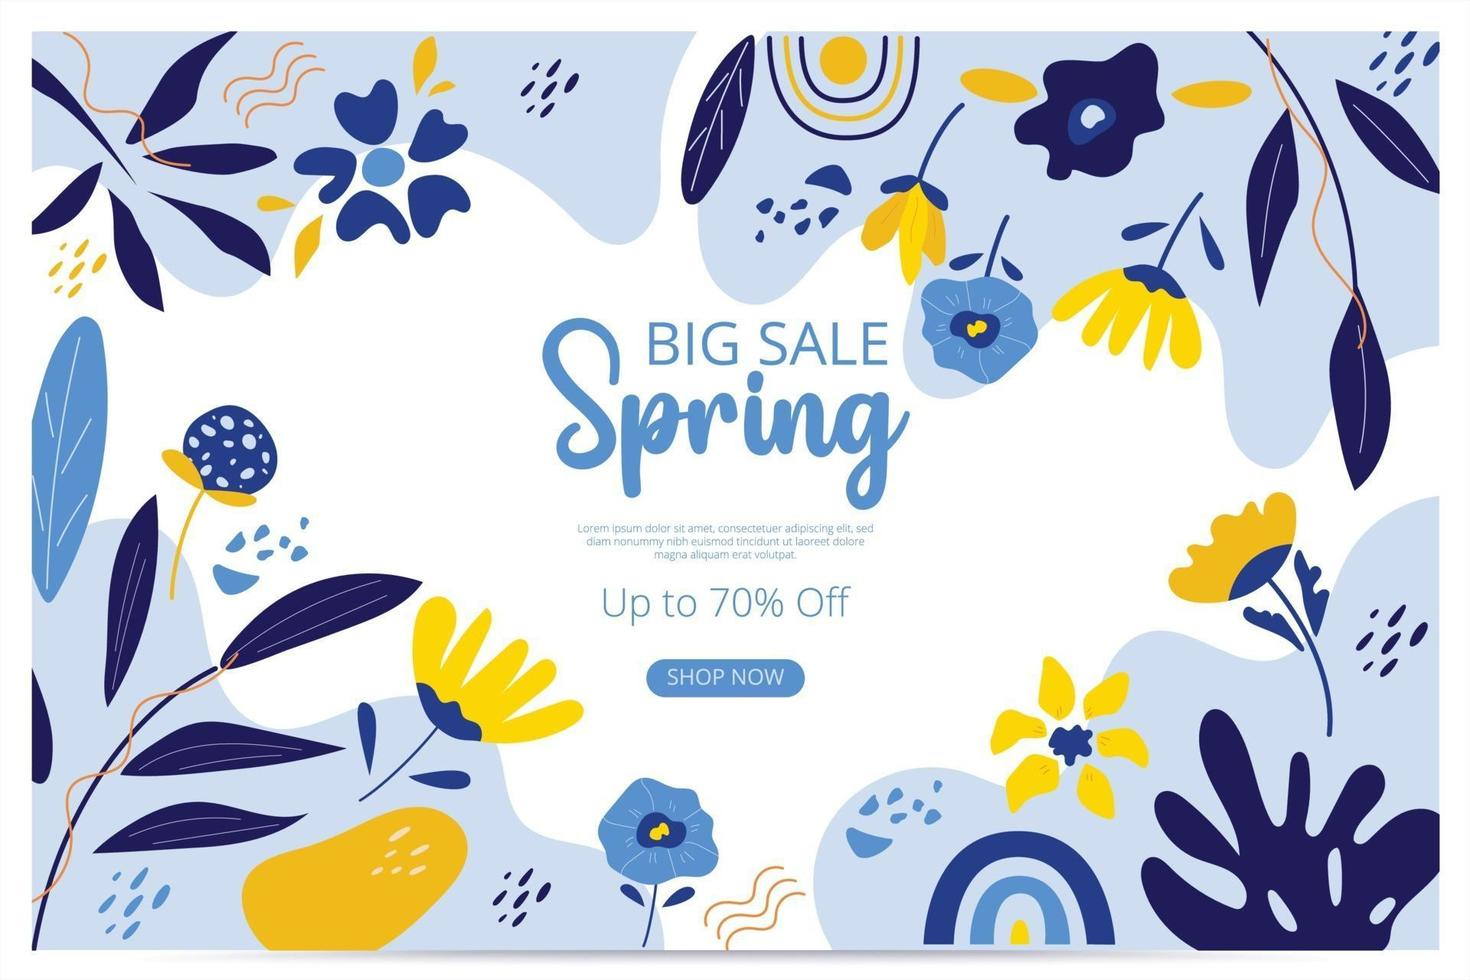 Big sale spring banner with blossom bloom. Sale banner. Vector illustration. Hand drawn. Organic flower design.